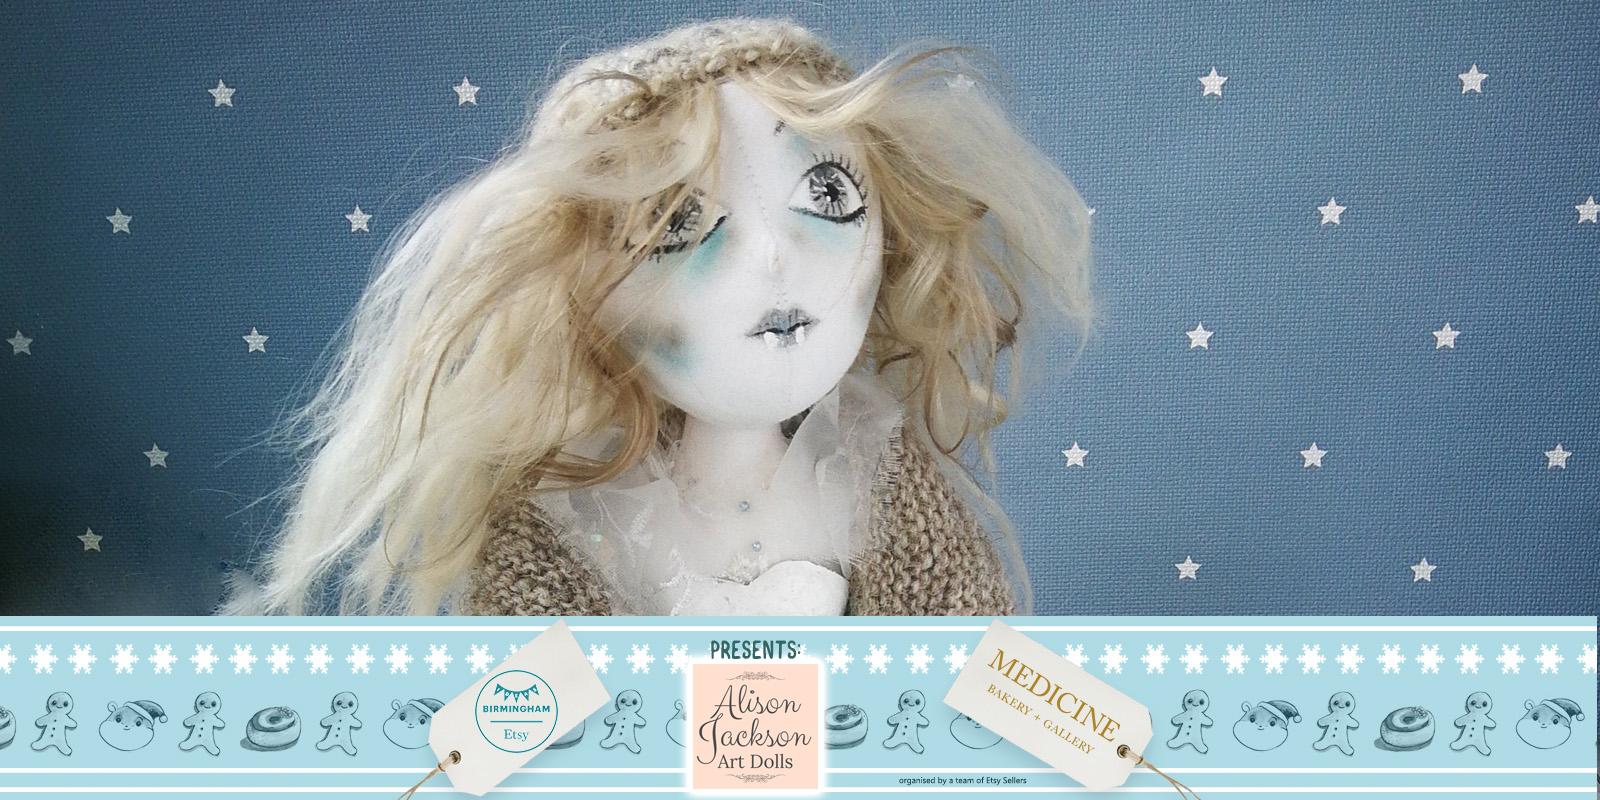 Alison Jackson Art Dolls